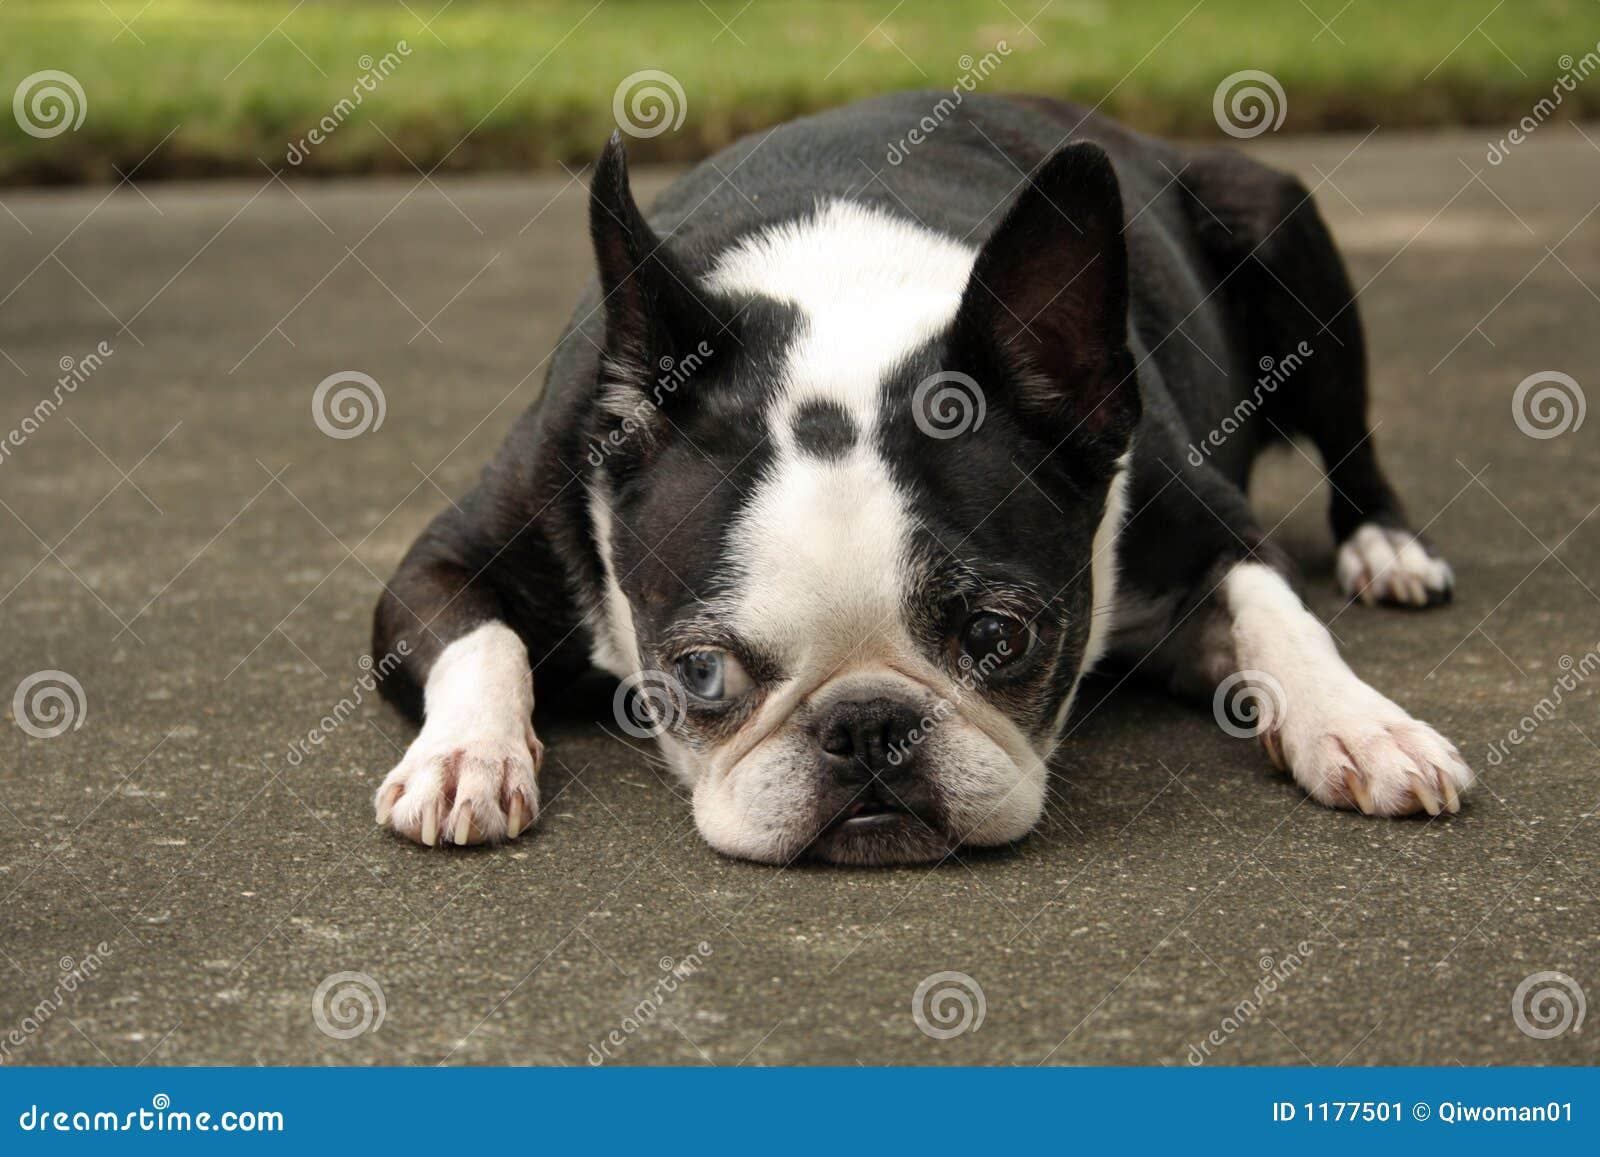 Terrier boston вниз лежа